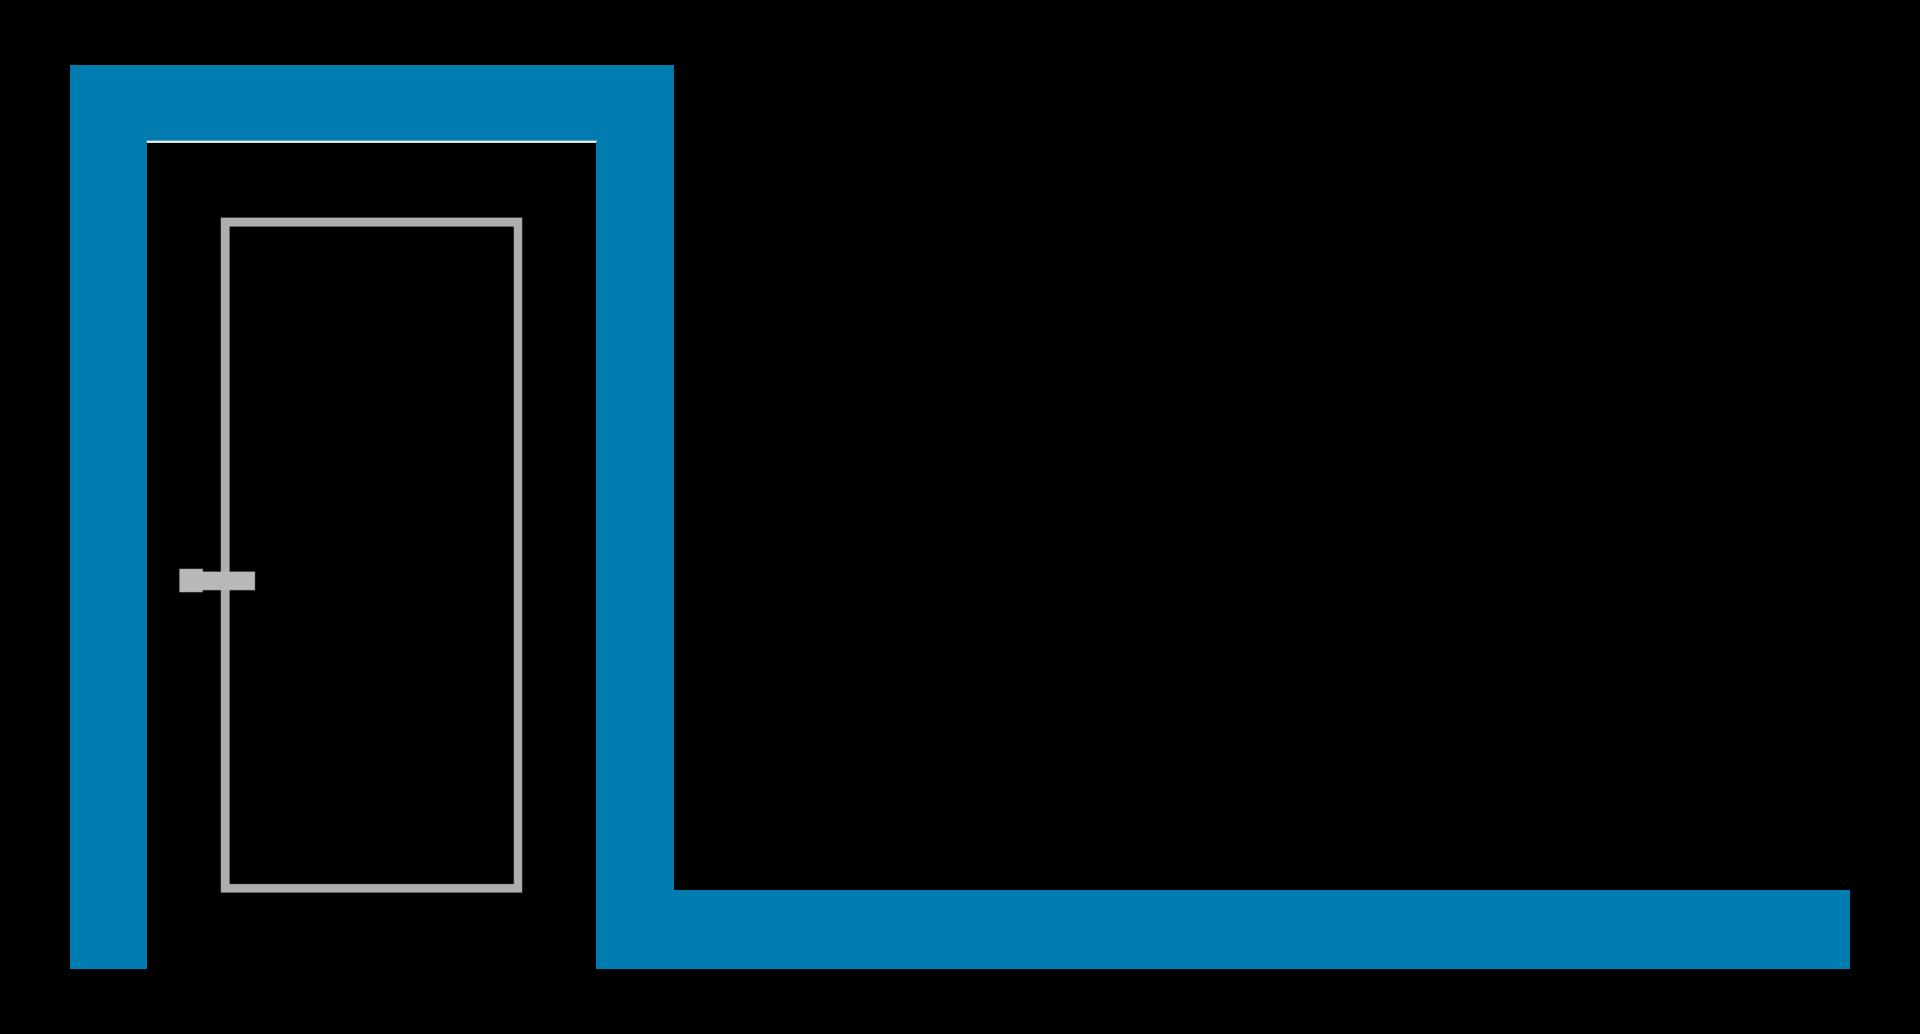 Don_lea_final_logo_1